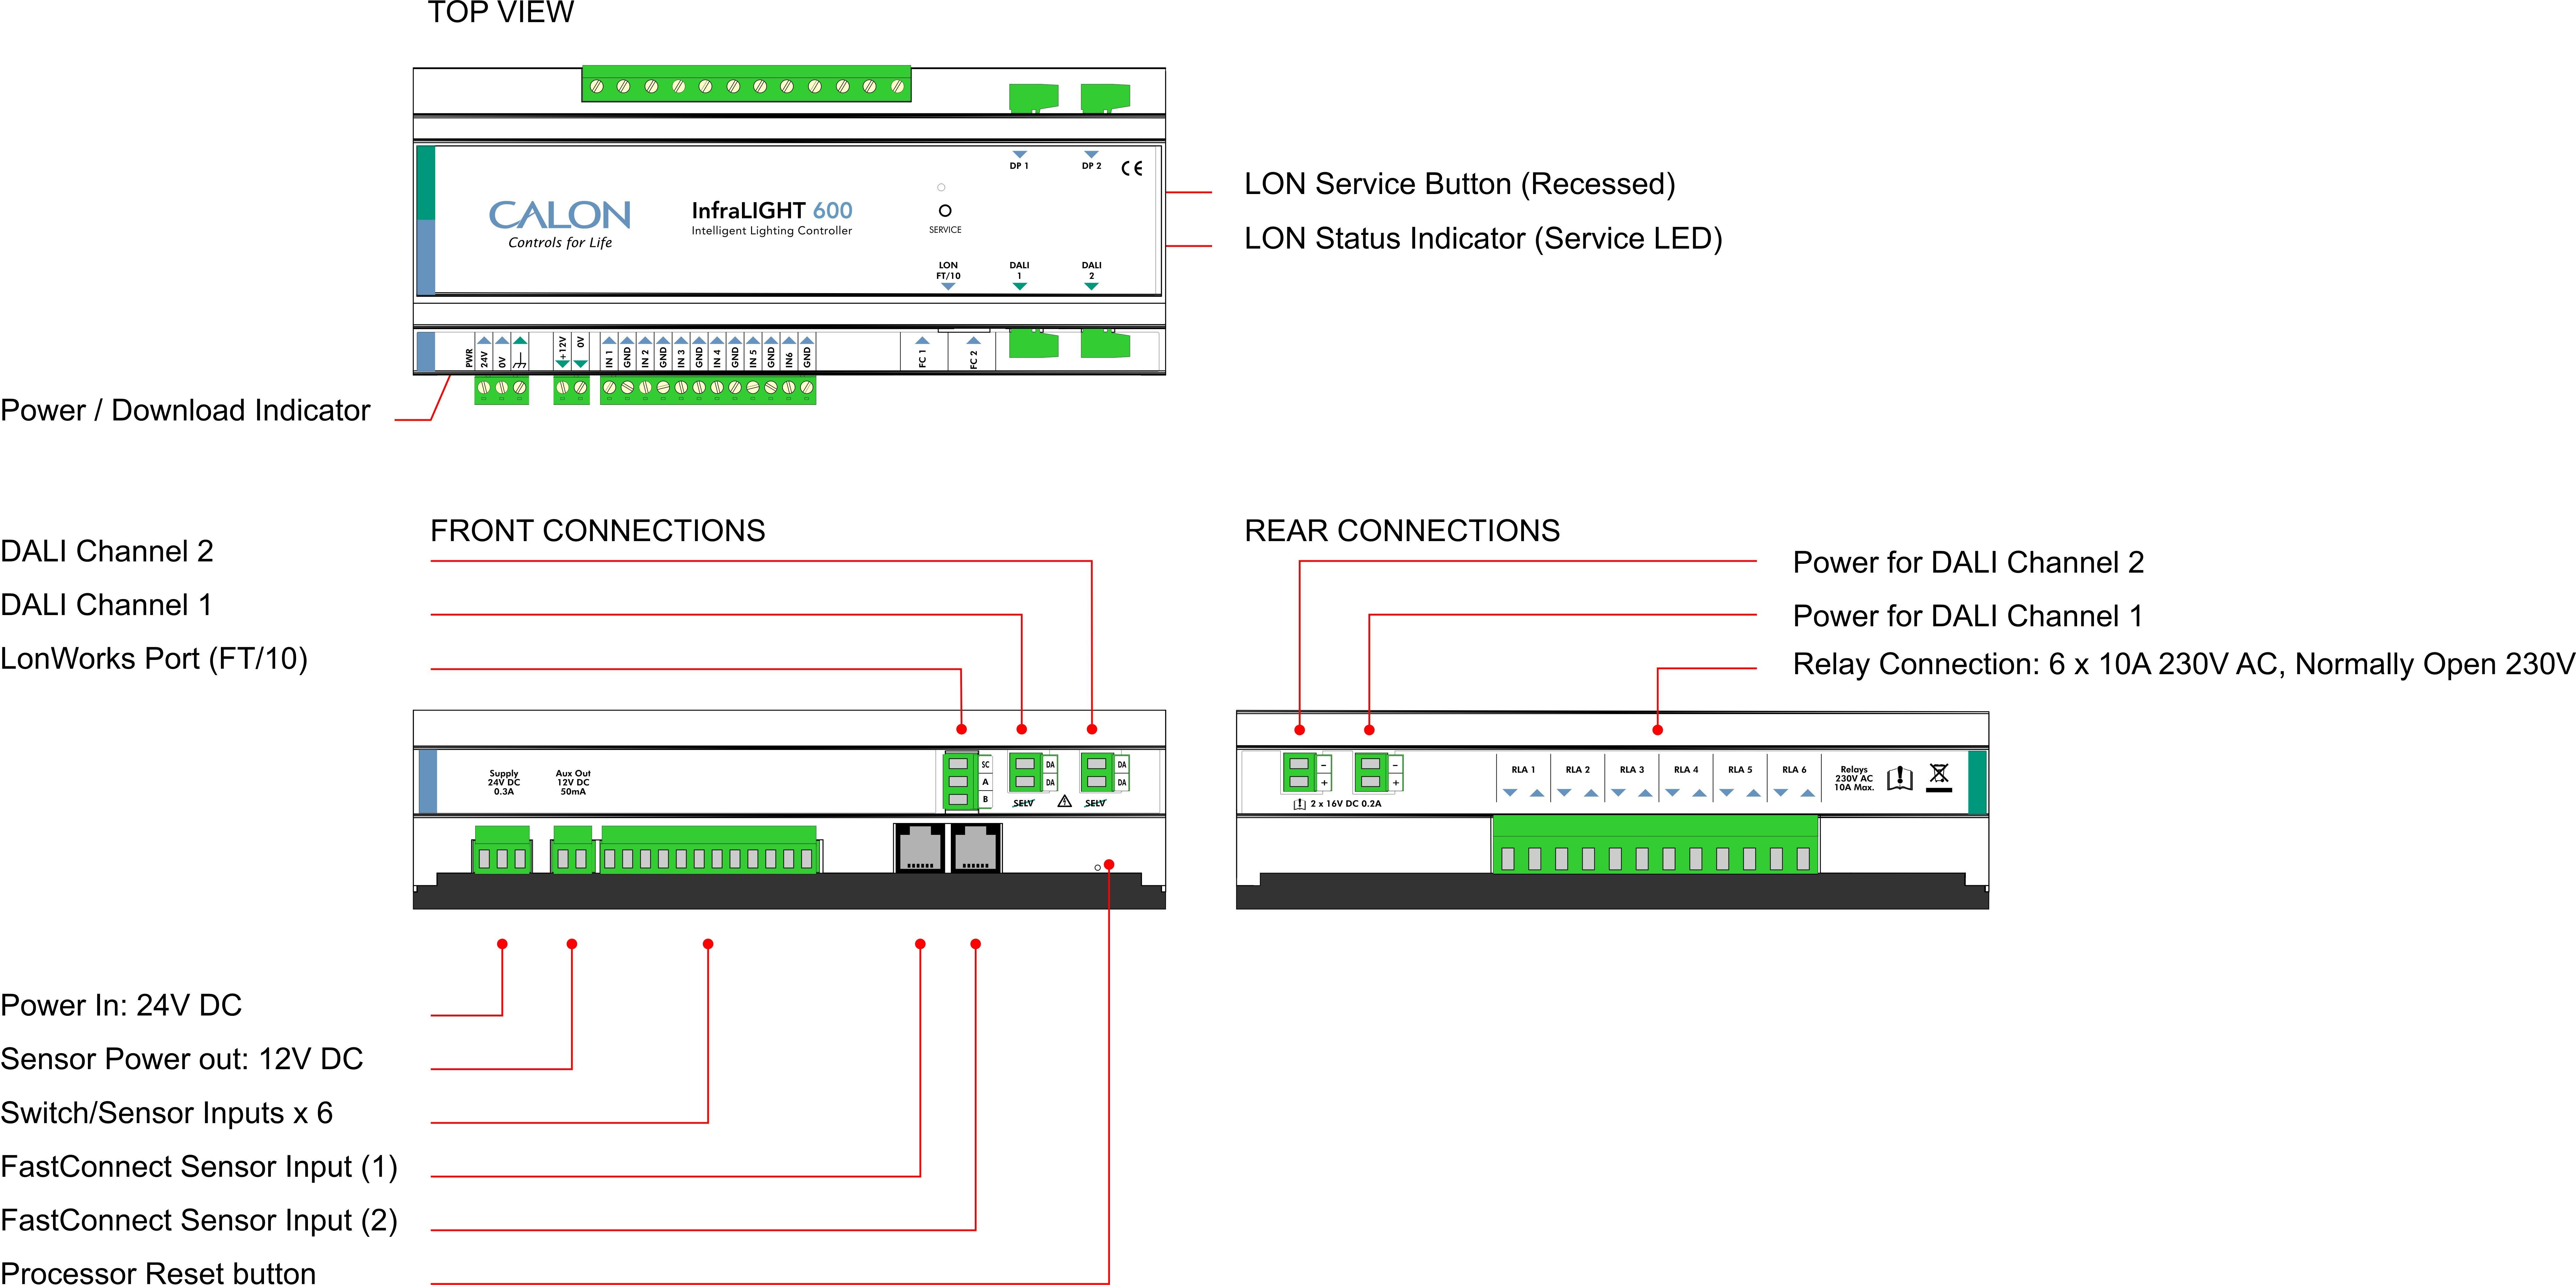 InfraLIGHT 600 lighting control